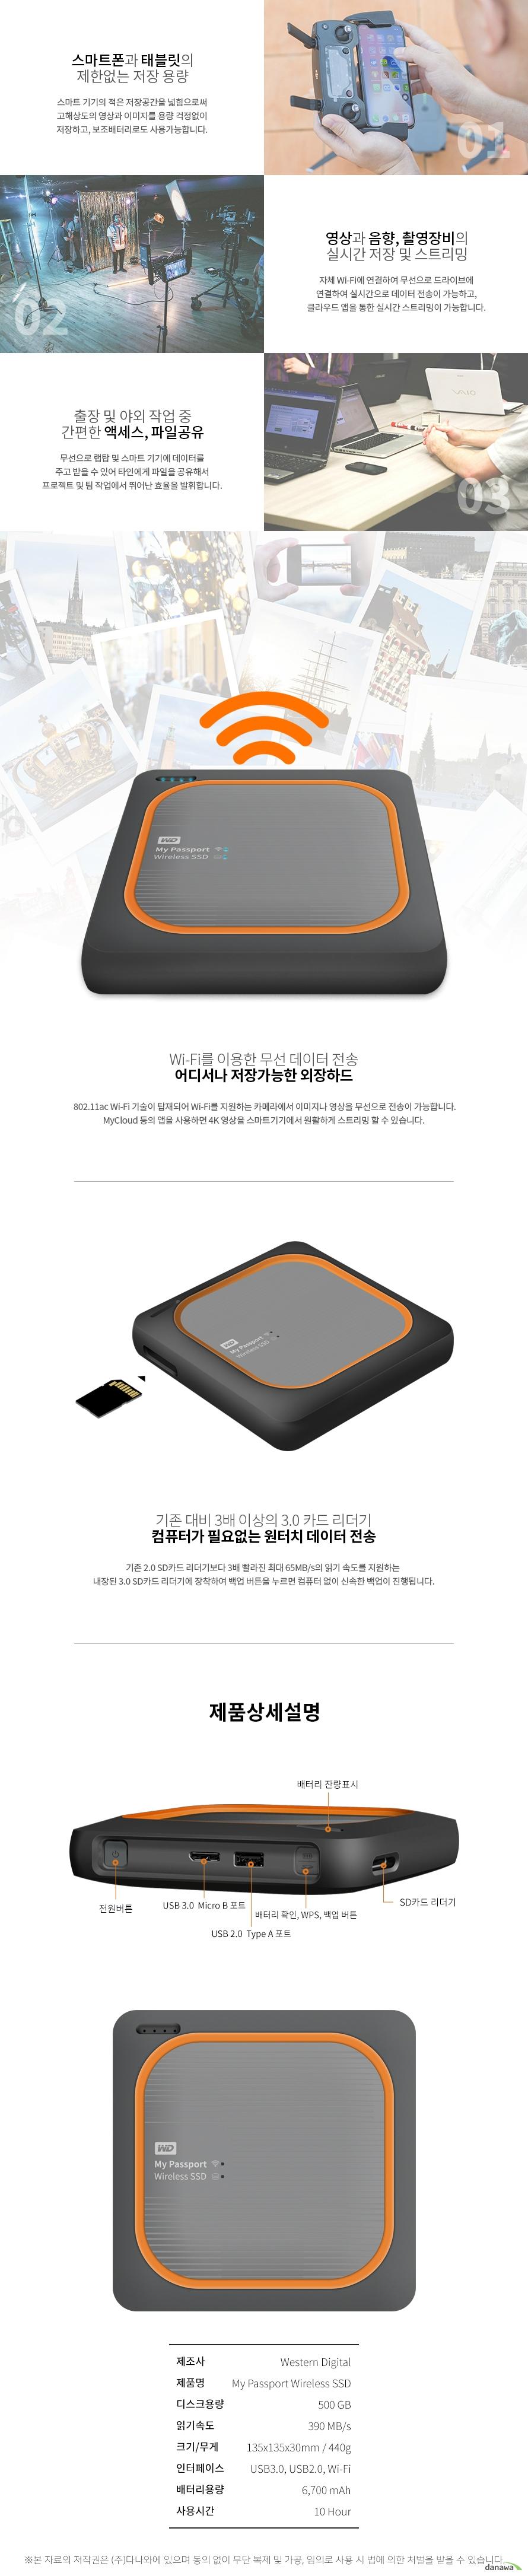 Western Digital WD My Passport Wireless SSD(500GB)